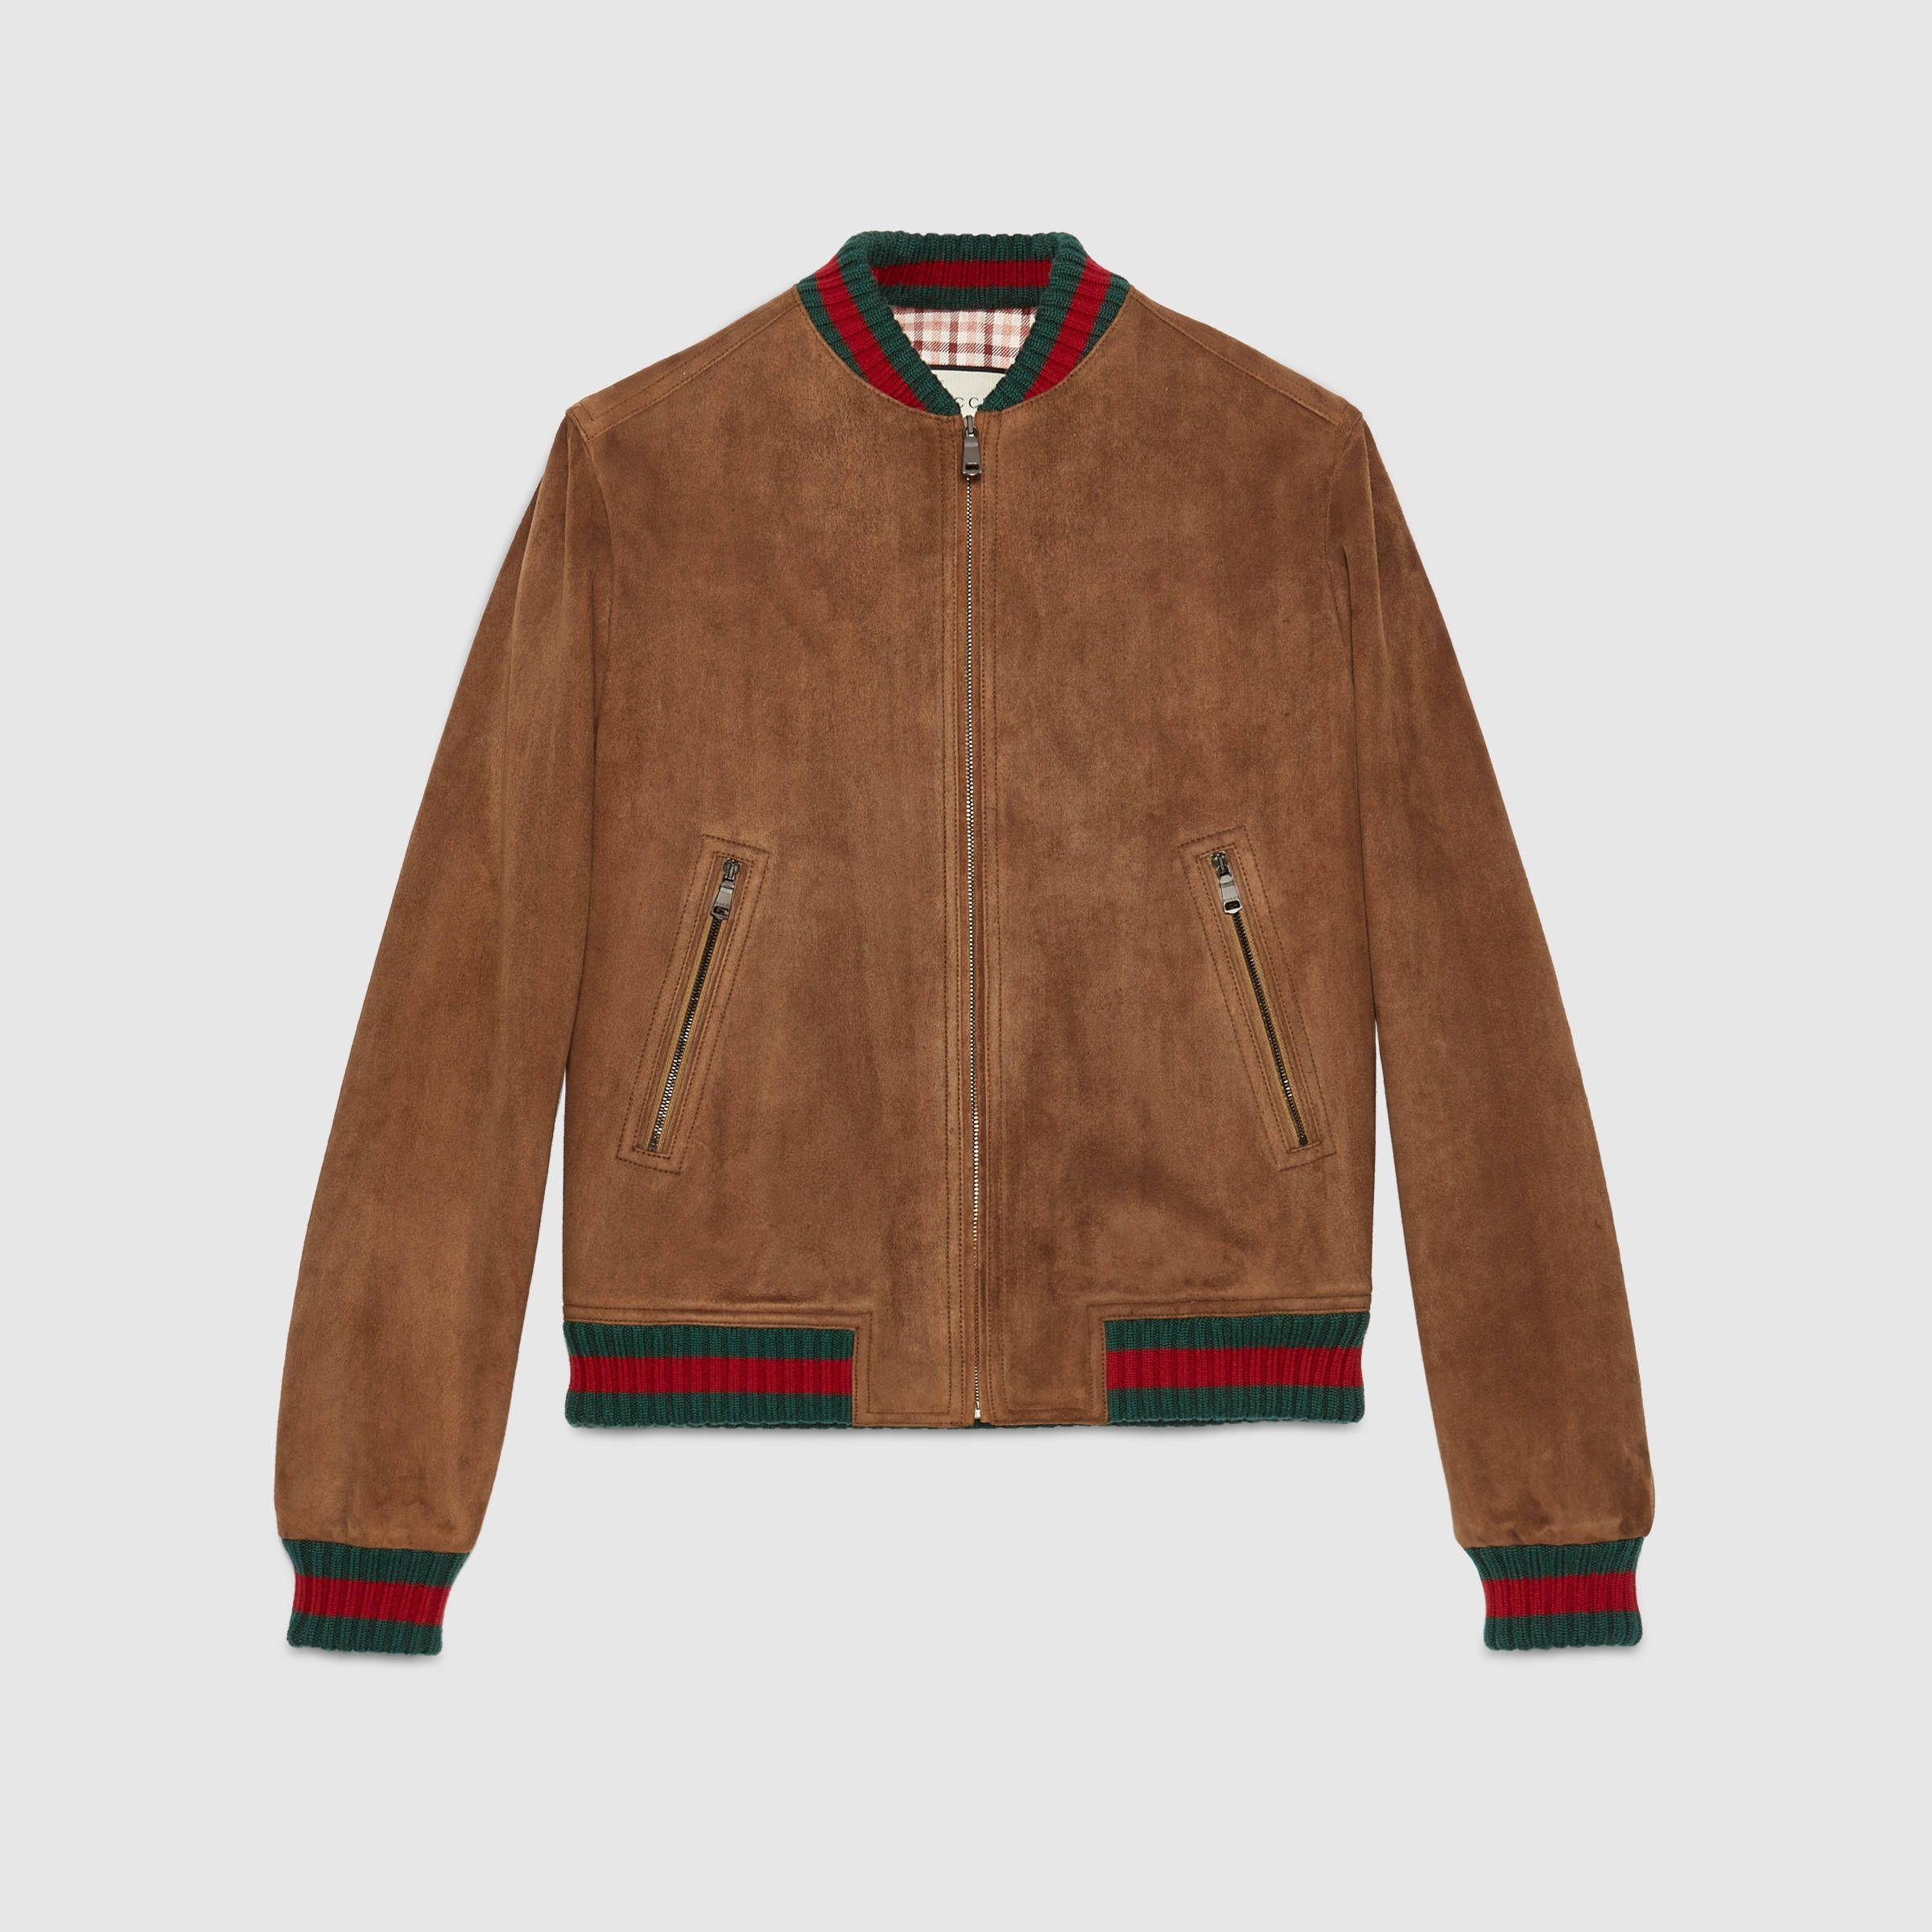 Gucci Suede Jacket With Web Jackets Overcoat Jacket Suede Jacket [ 2400 x 2400 Pixel ]